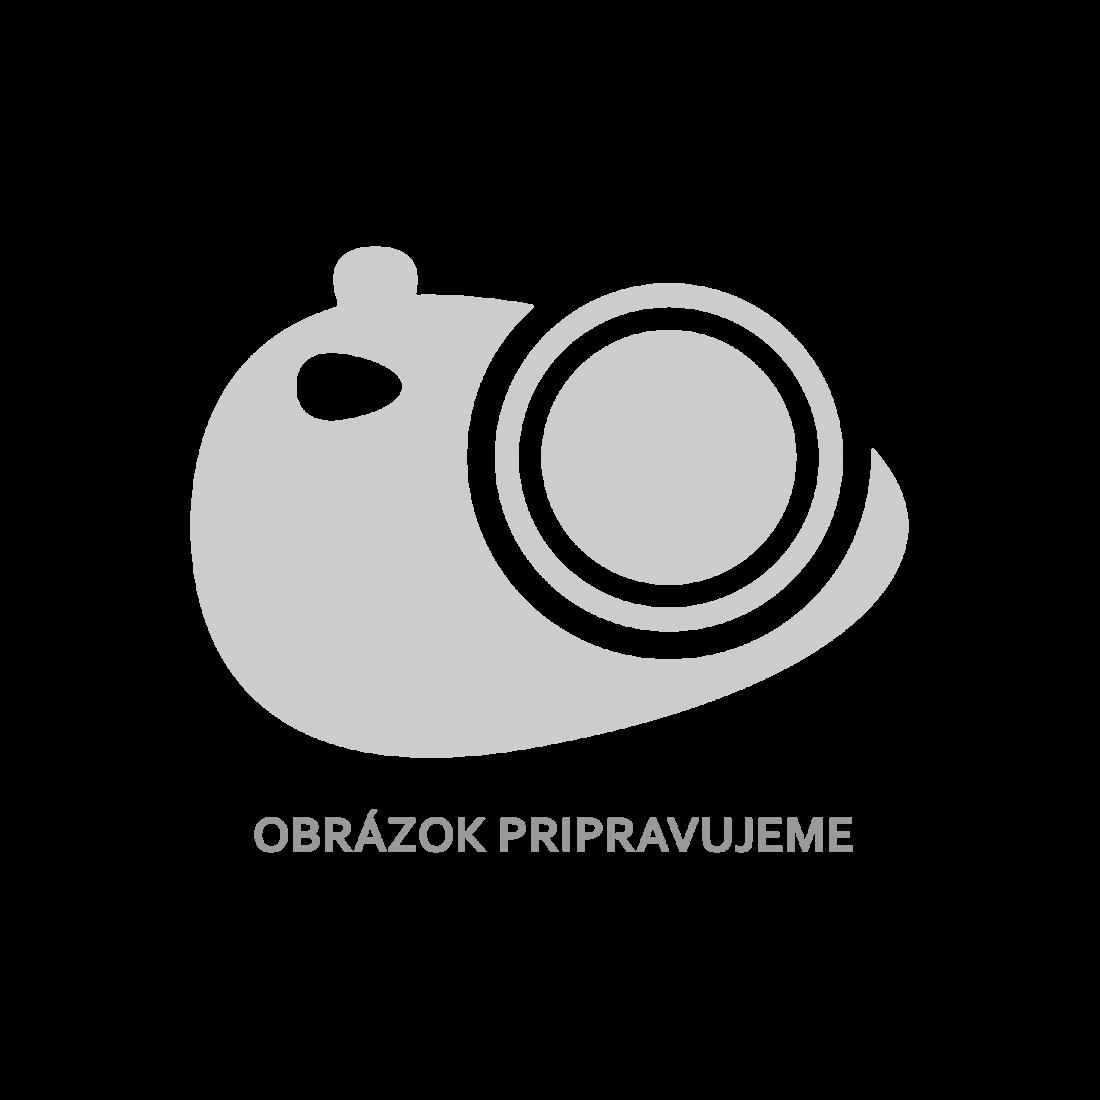 Nástenná lampa z nerezovej ocele s pohybovým senzorom